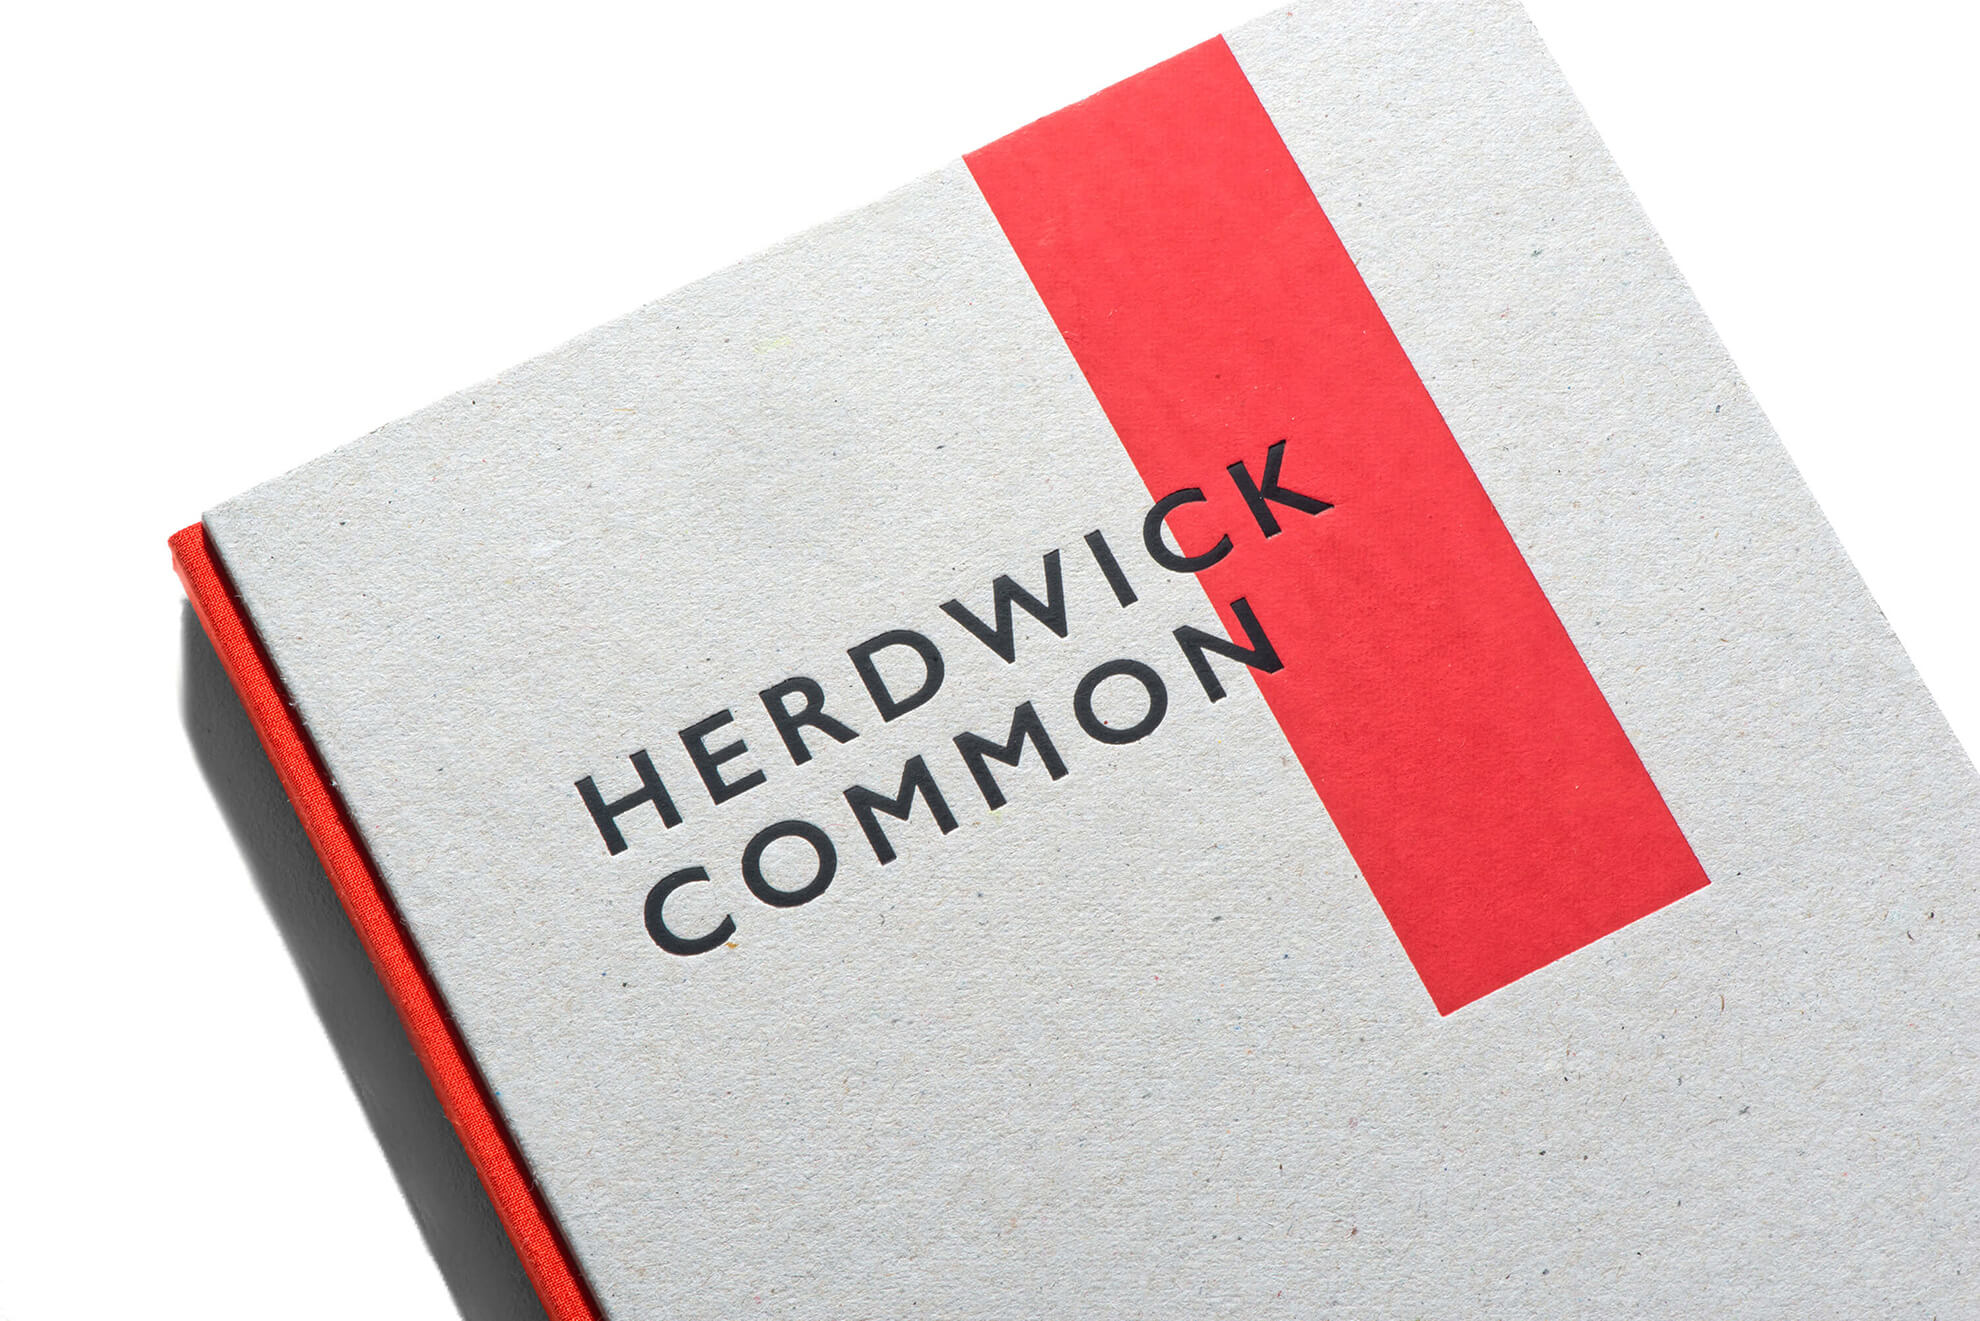 Cherchbir, Herdwick Common, Landscape, England, Photography, Agency, Film, Book